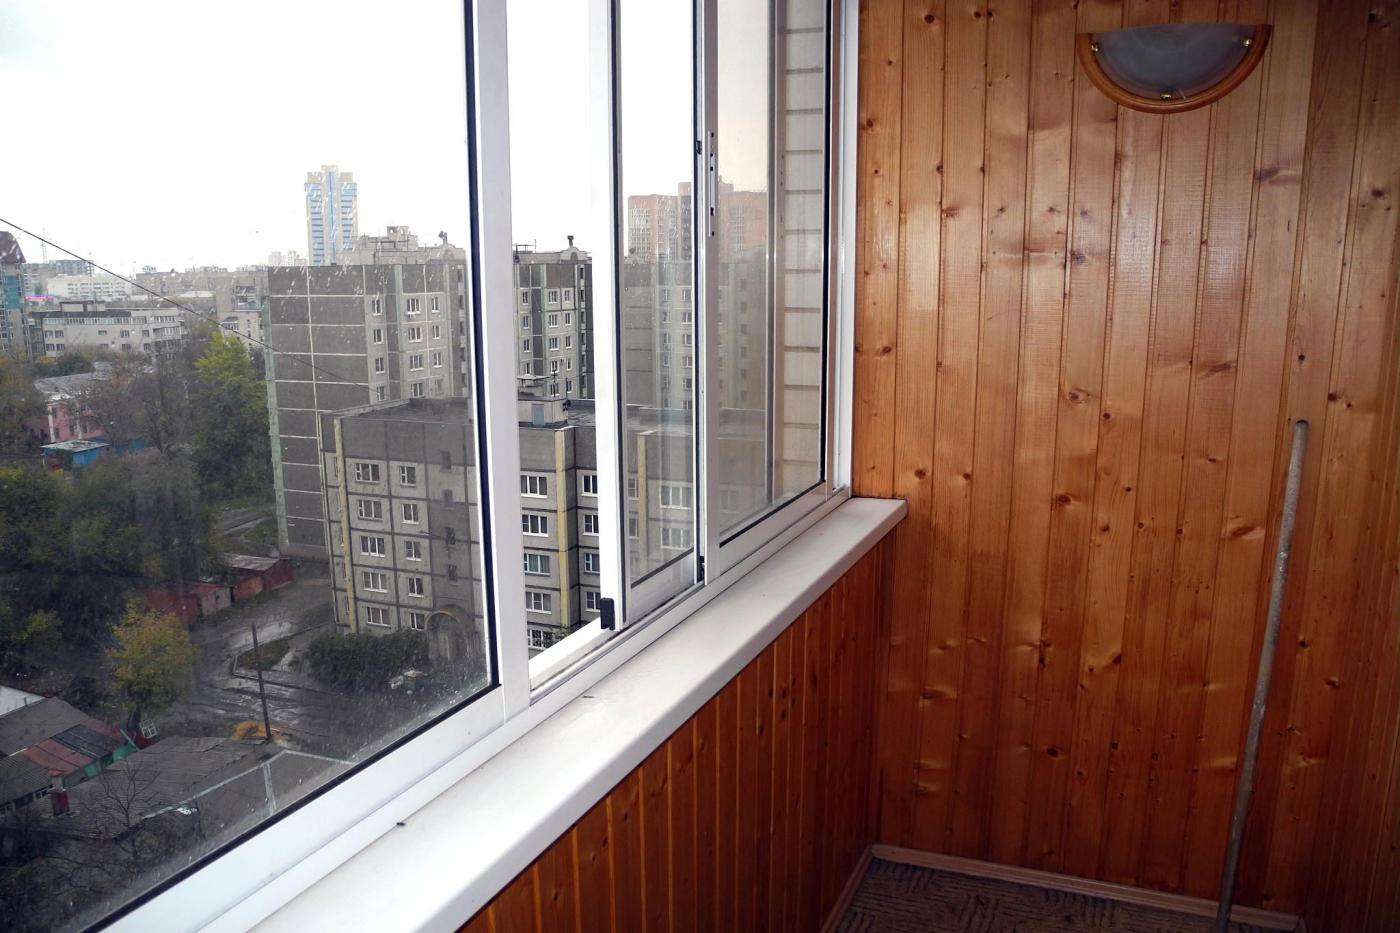 2-комнатная квартира посуточно (вариант № 3876), ул. Войкова улица, фото № 12